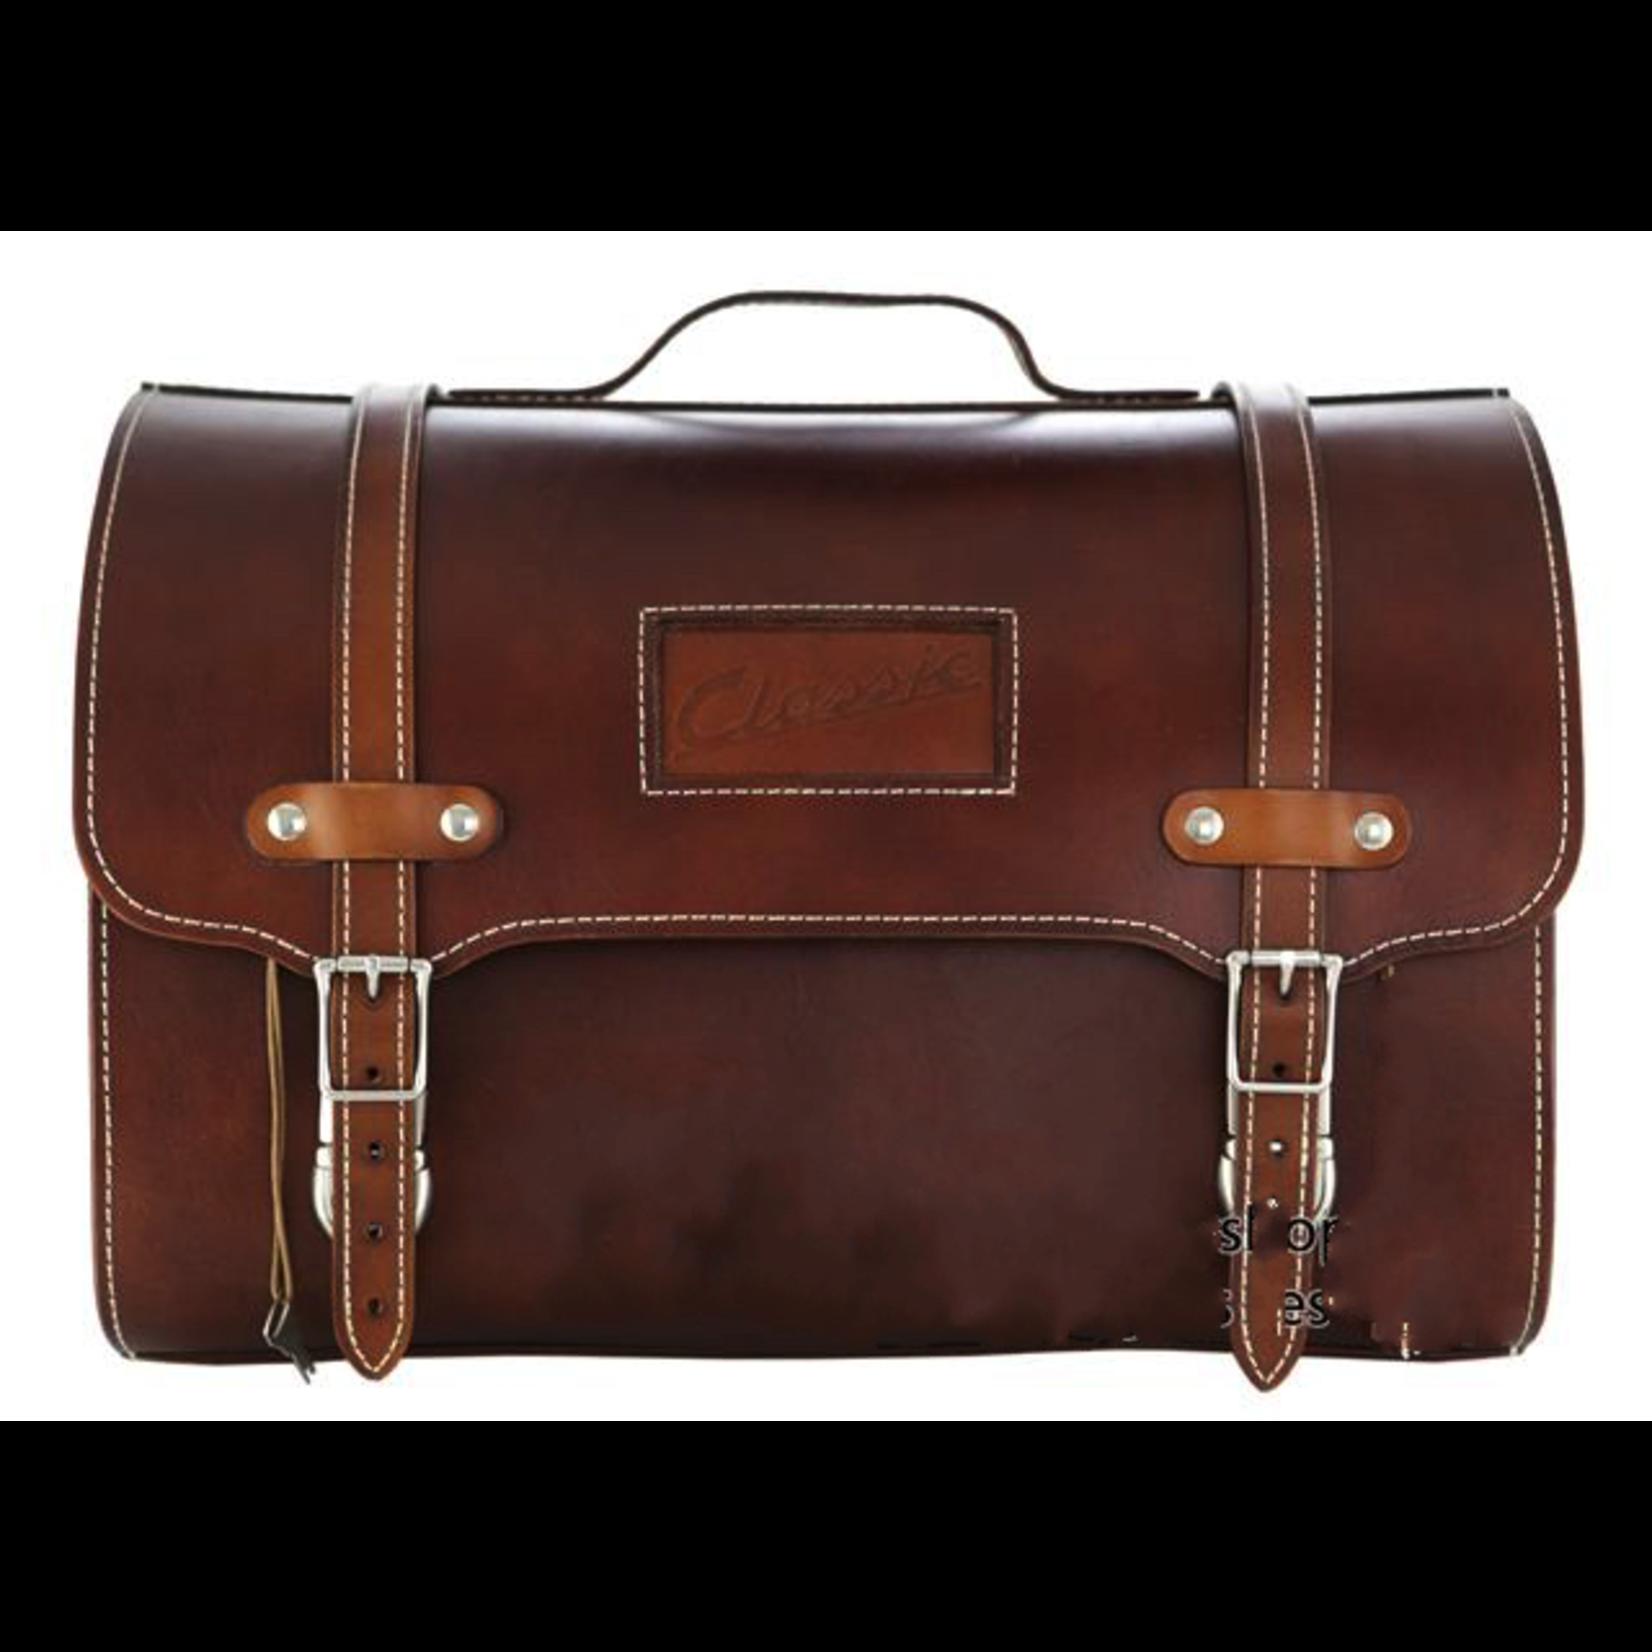 Accessories Top Case, Vespa Leather Bag Dark Brown